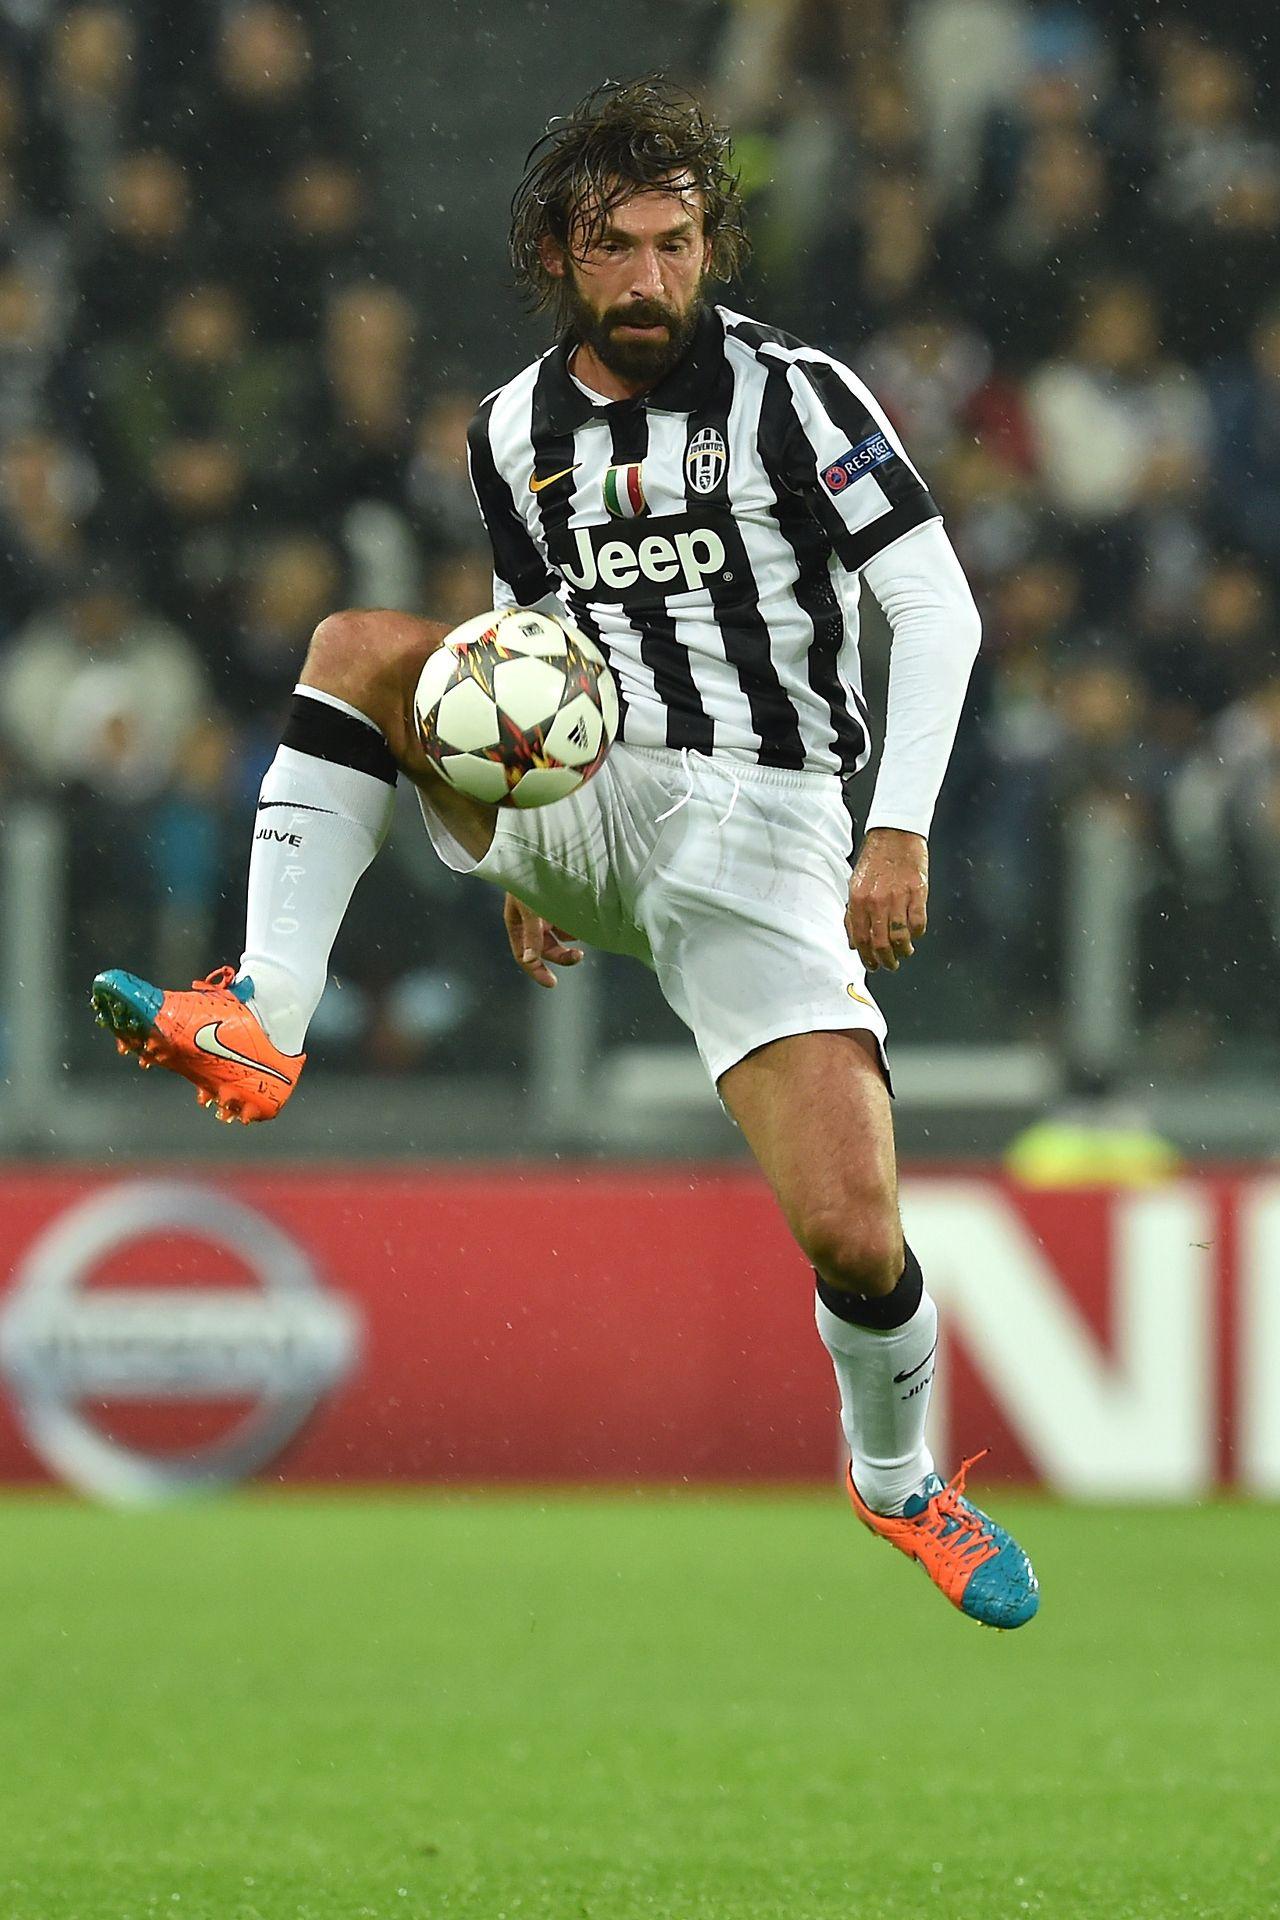 Andrea Pirlo Of Juventus Andrea Pirlo Fantasy Football Uk Juventus